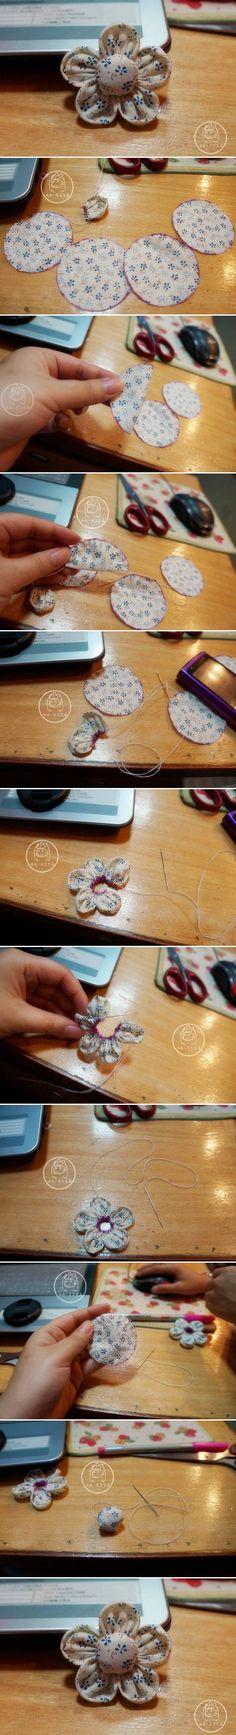 DIY Quick Handmade Fabric Flower DIY Quick Handmade Fabric Flower. Would make super cute barrettes.